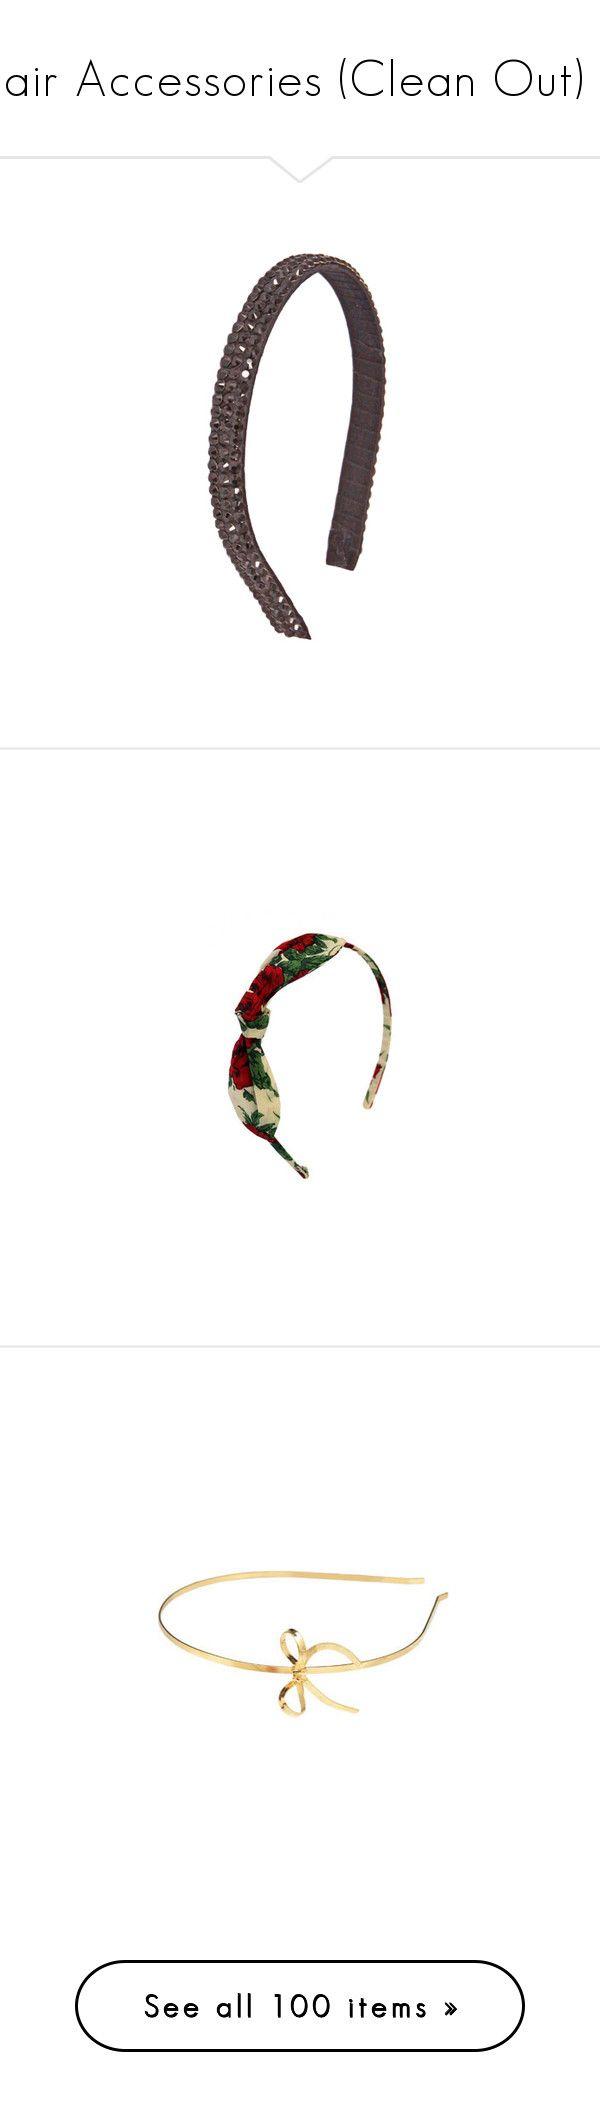 """Hair Accessories (Clean Out) 2"" by dev-lynn ❤ liked on Polyvore featuring accessories, hair accessories, hair, headbands, hairbands, tarina tarantino, ribbon wrapped headbands, crystal headband, wrap headbands and crystal hair accessories"